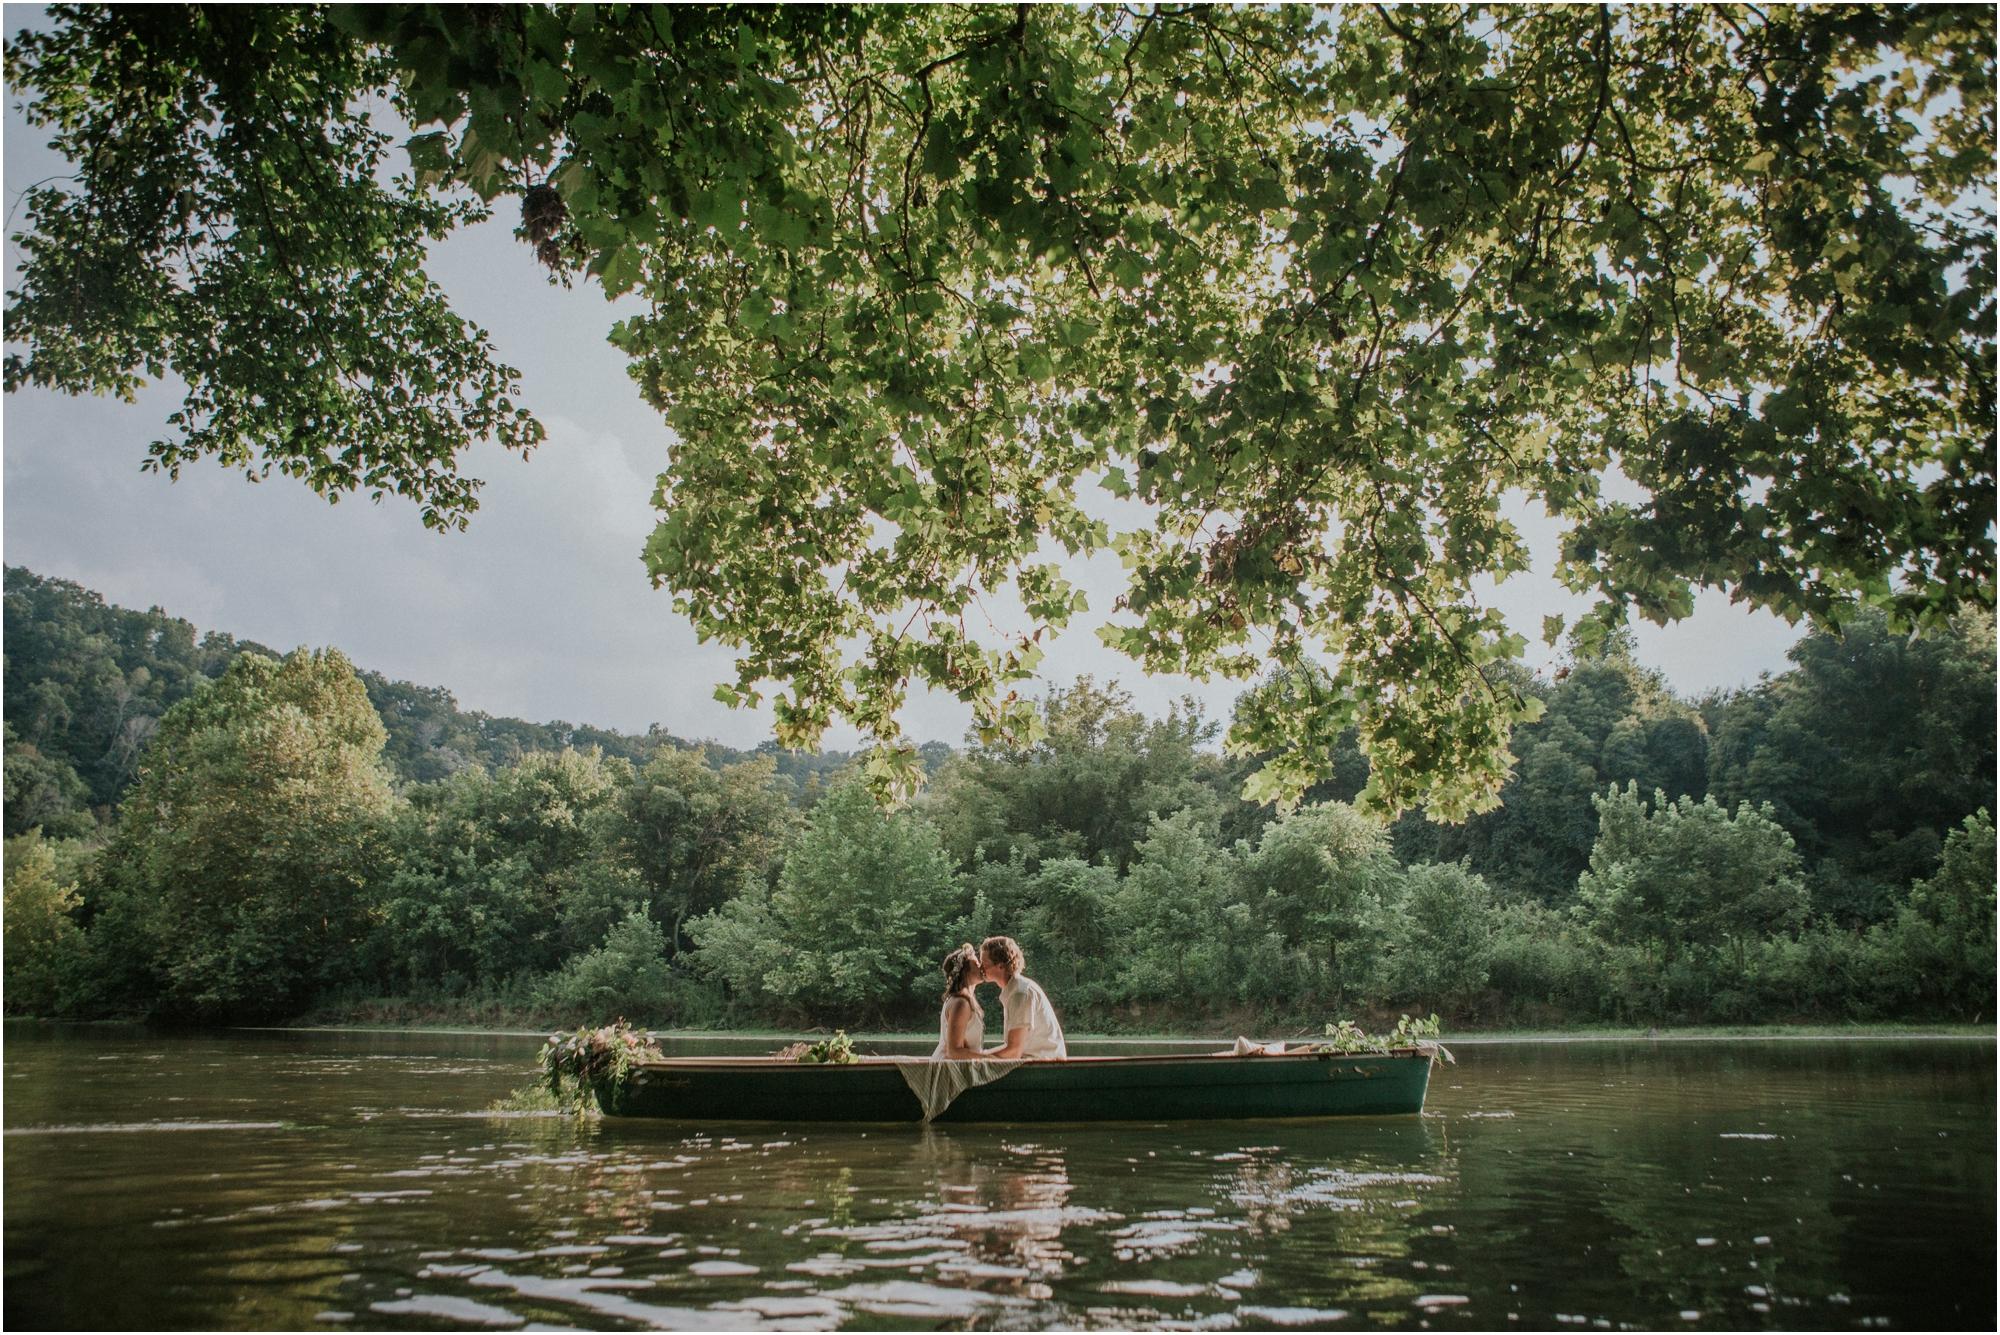 homestead-on-the-holston-hiltons-virginia-bohemian-canoe-styled-shoot-northeast-tennessee-elopement-wild-free-spirit_0013.jpg